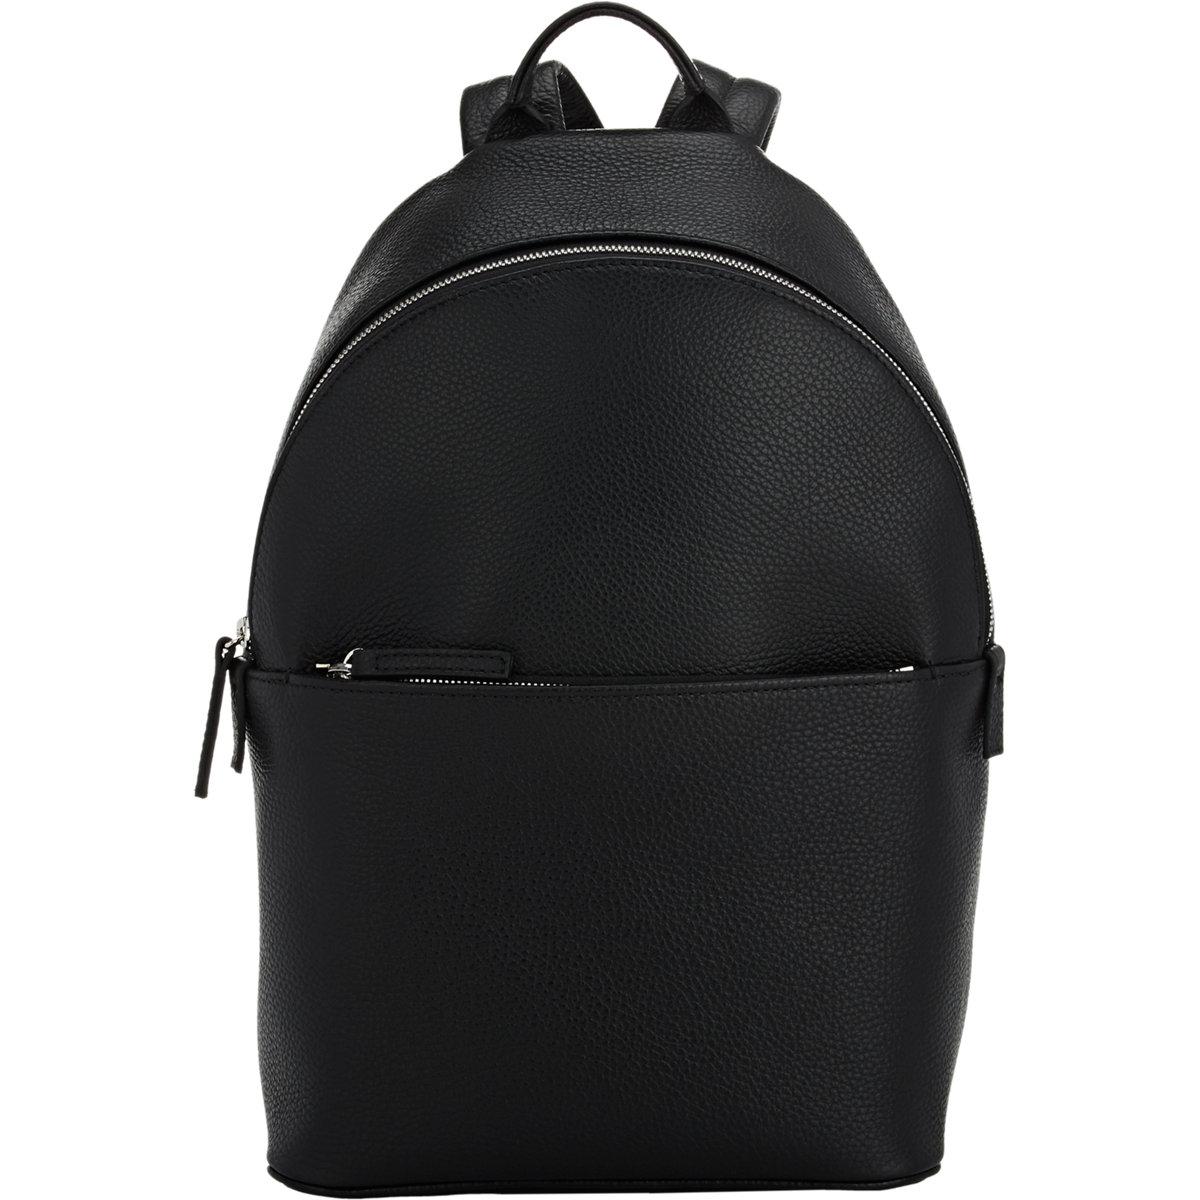 lyst barneys new york zip around backpack in black for men. Black Bedroom Furniture Sets. Home Design Ideas